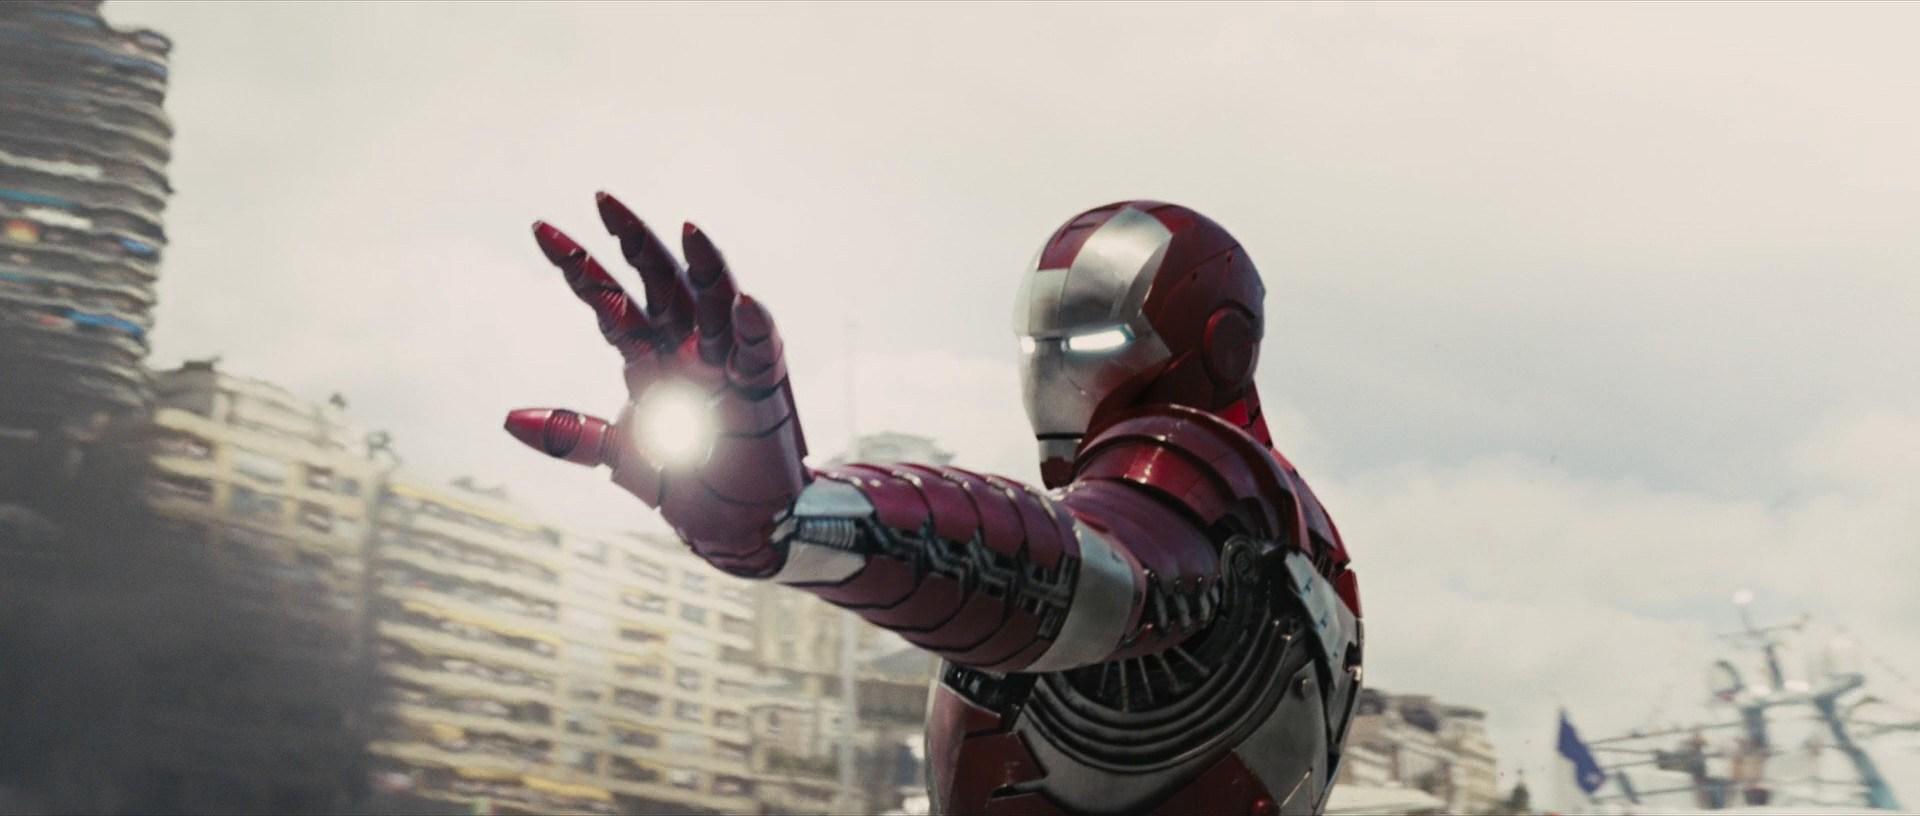 File:IRON-MAN-2-markV.jpg